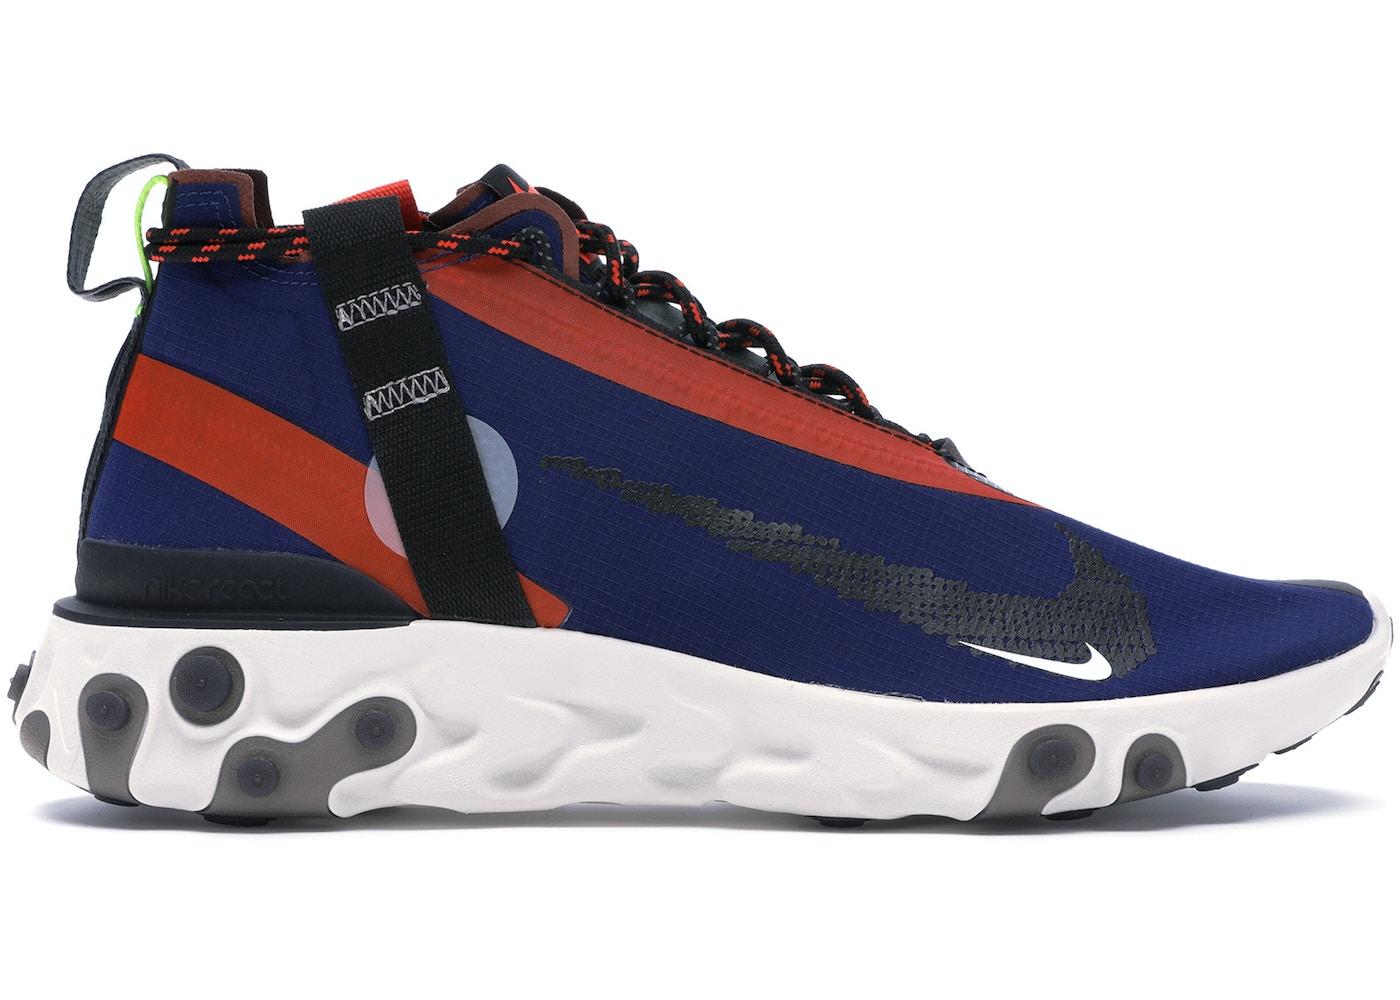 heno Precaución Prestado  Nike React Runner Mid WR ISPA Blue Void Team Orange - AT3143-400